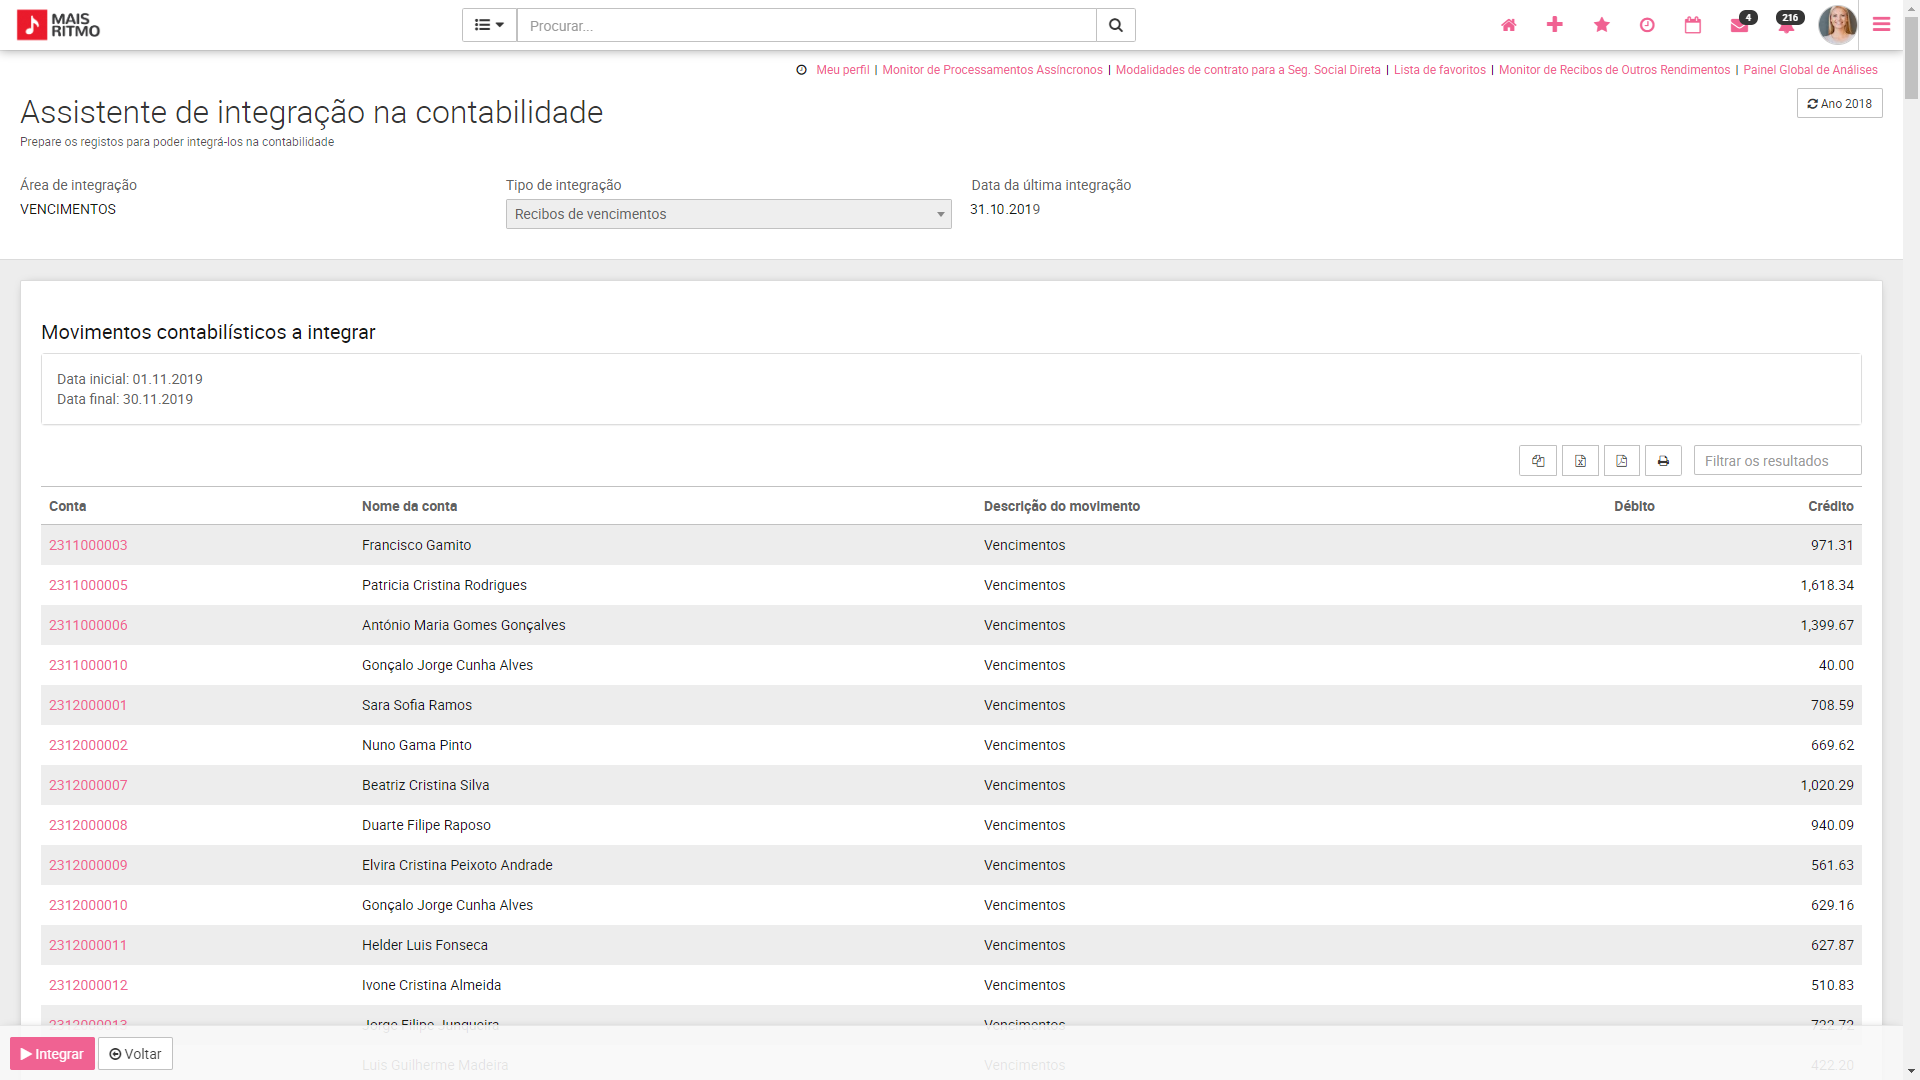 Monitor_Assistente_Integracoes_Contabilidade_vencimentos_web4